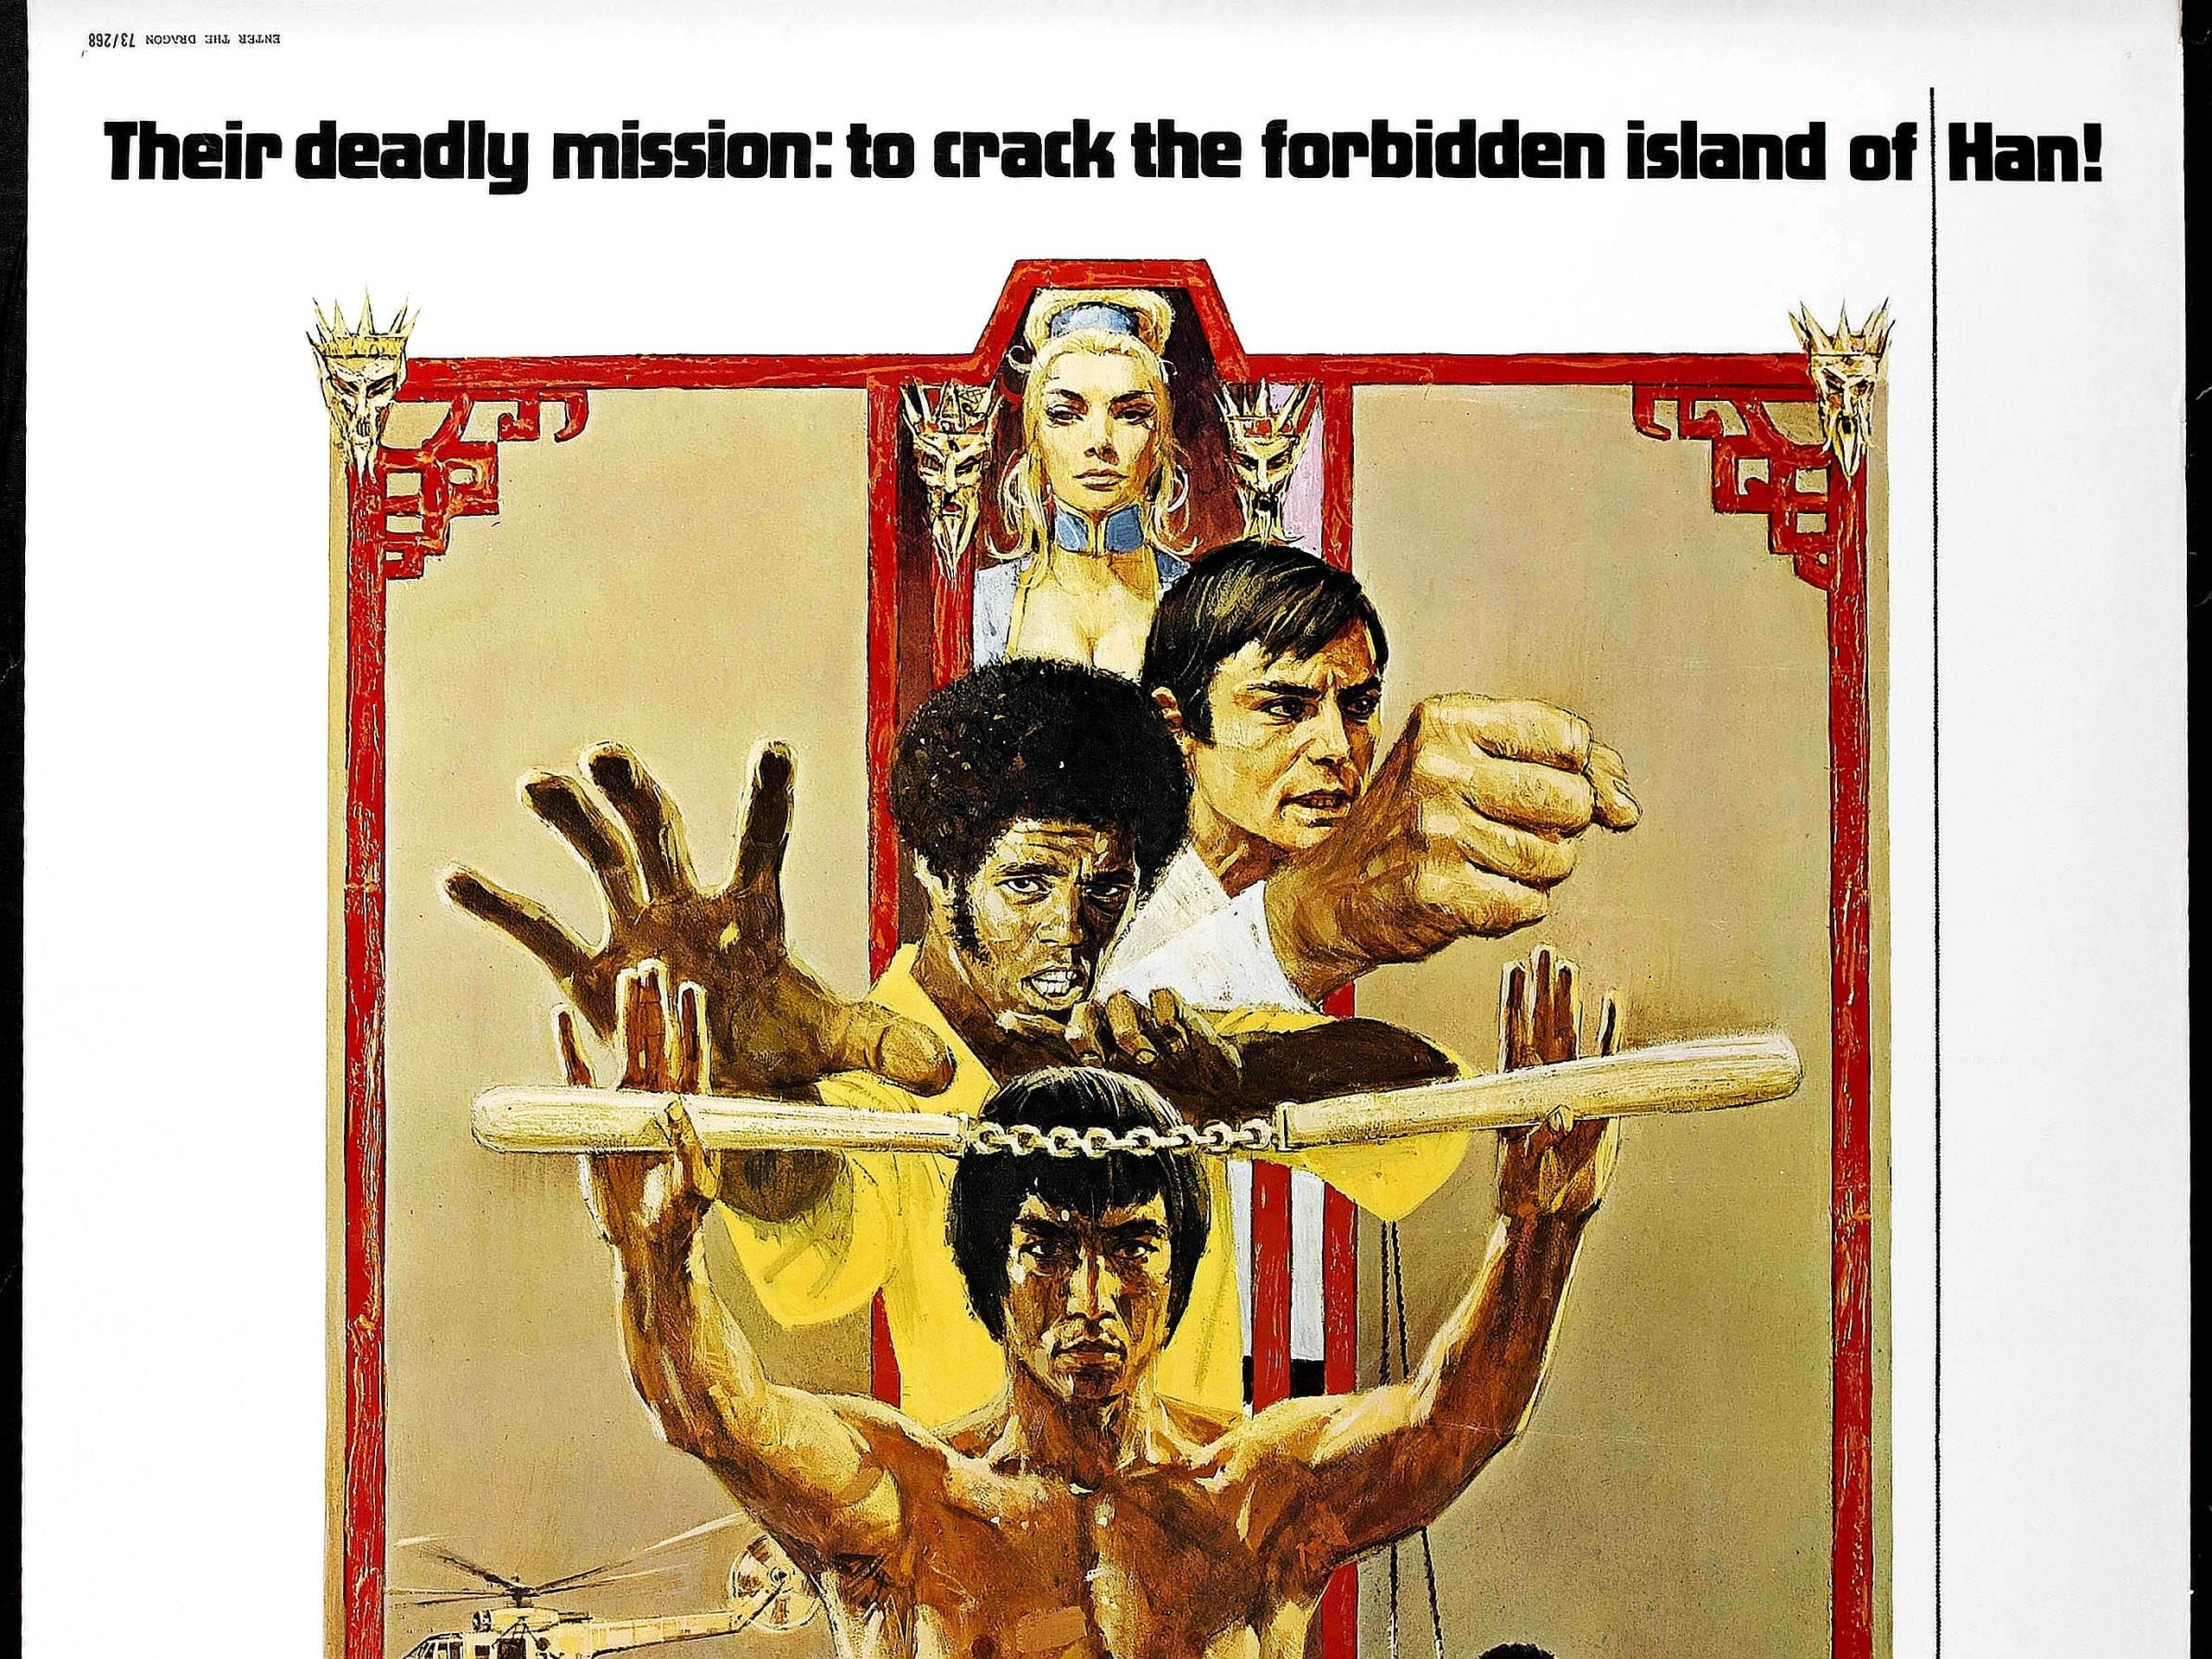 Elegant Bruce Lee Enter The Dragon Poster And Cool - Enter The Dragon Poster Hd - HD Wallpaper